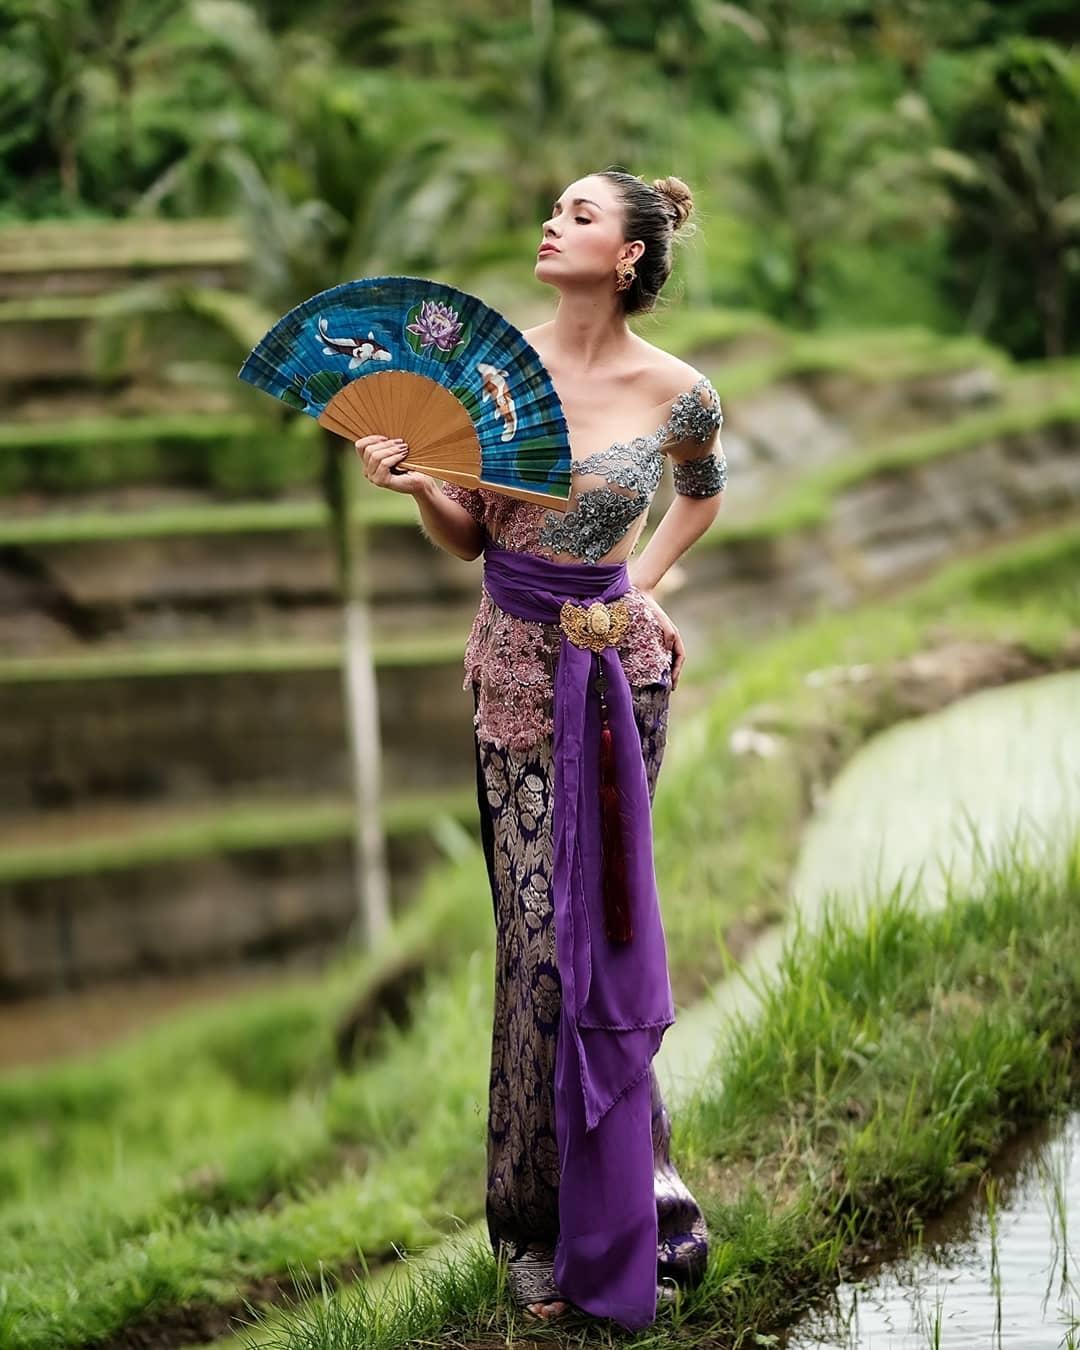 hany portocarrero, 1st runner-up de miss global 2019. - Página 2 89744510